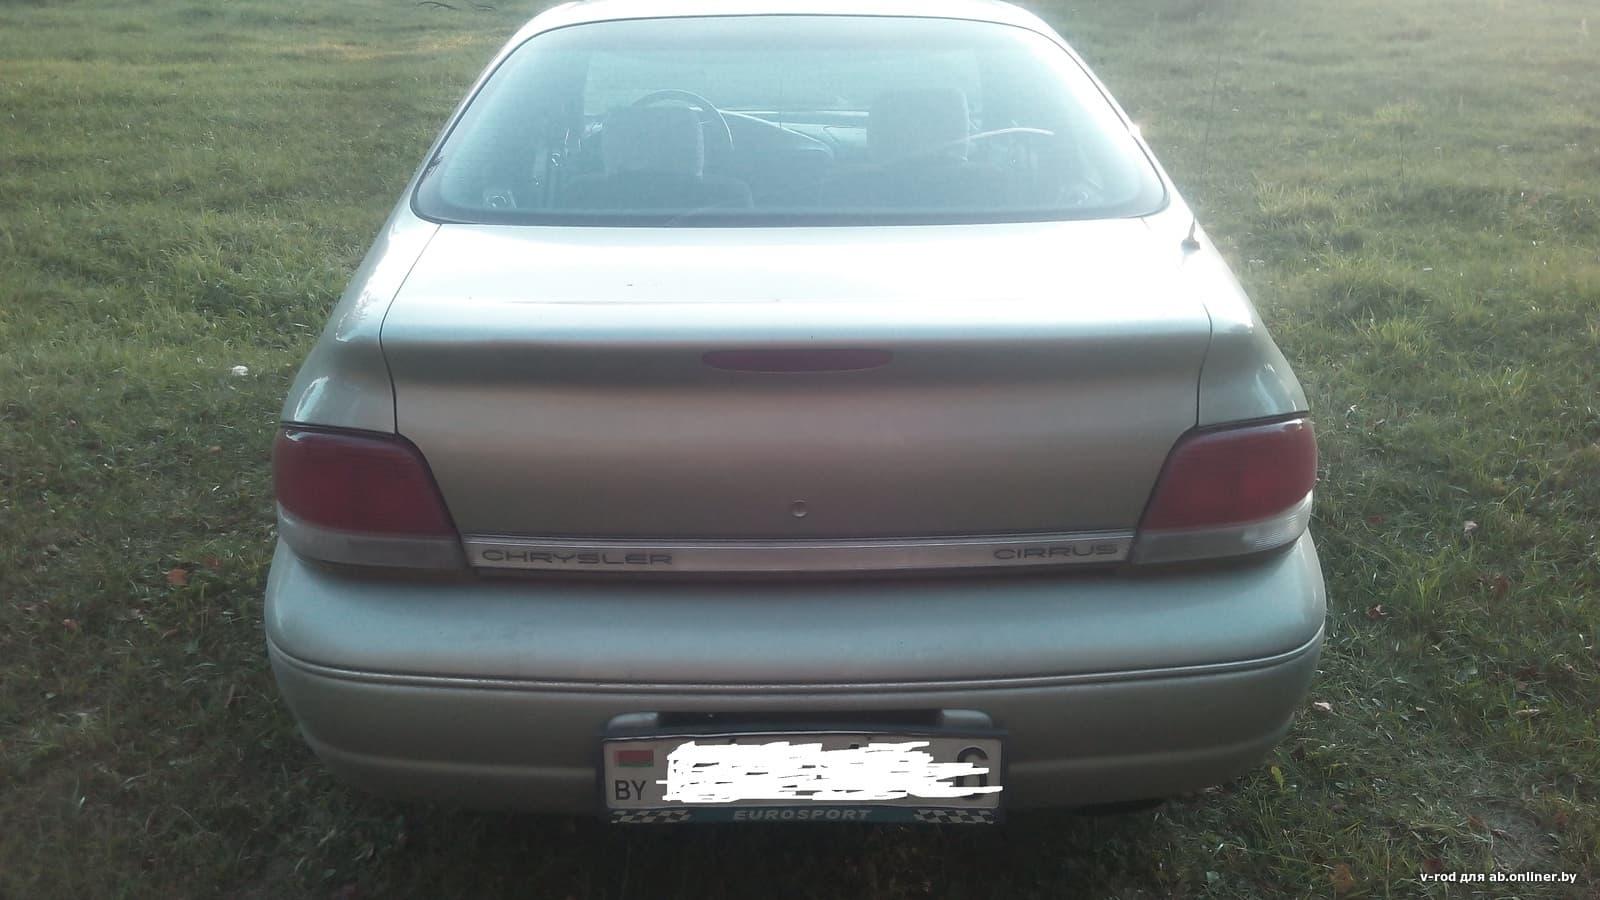 Chrysler Cirrus LXi